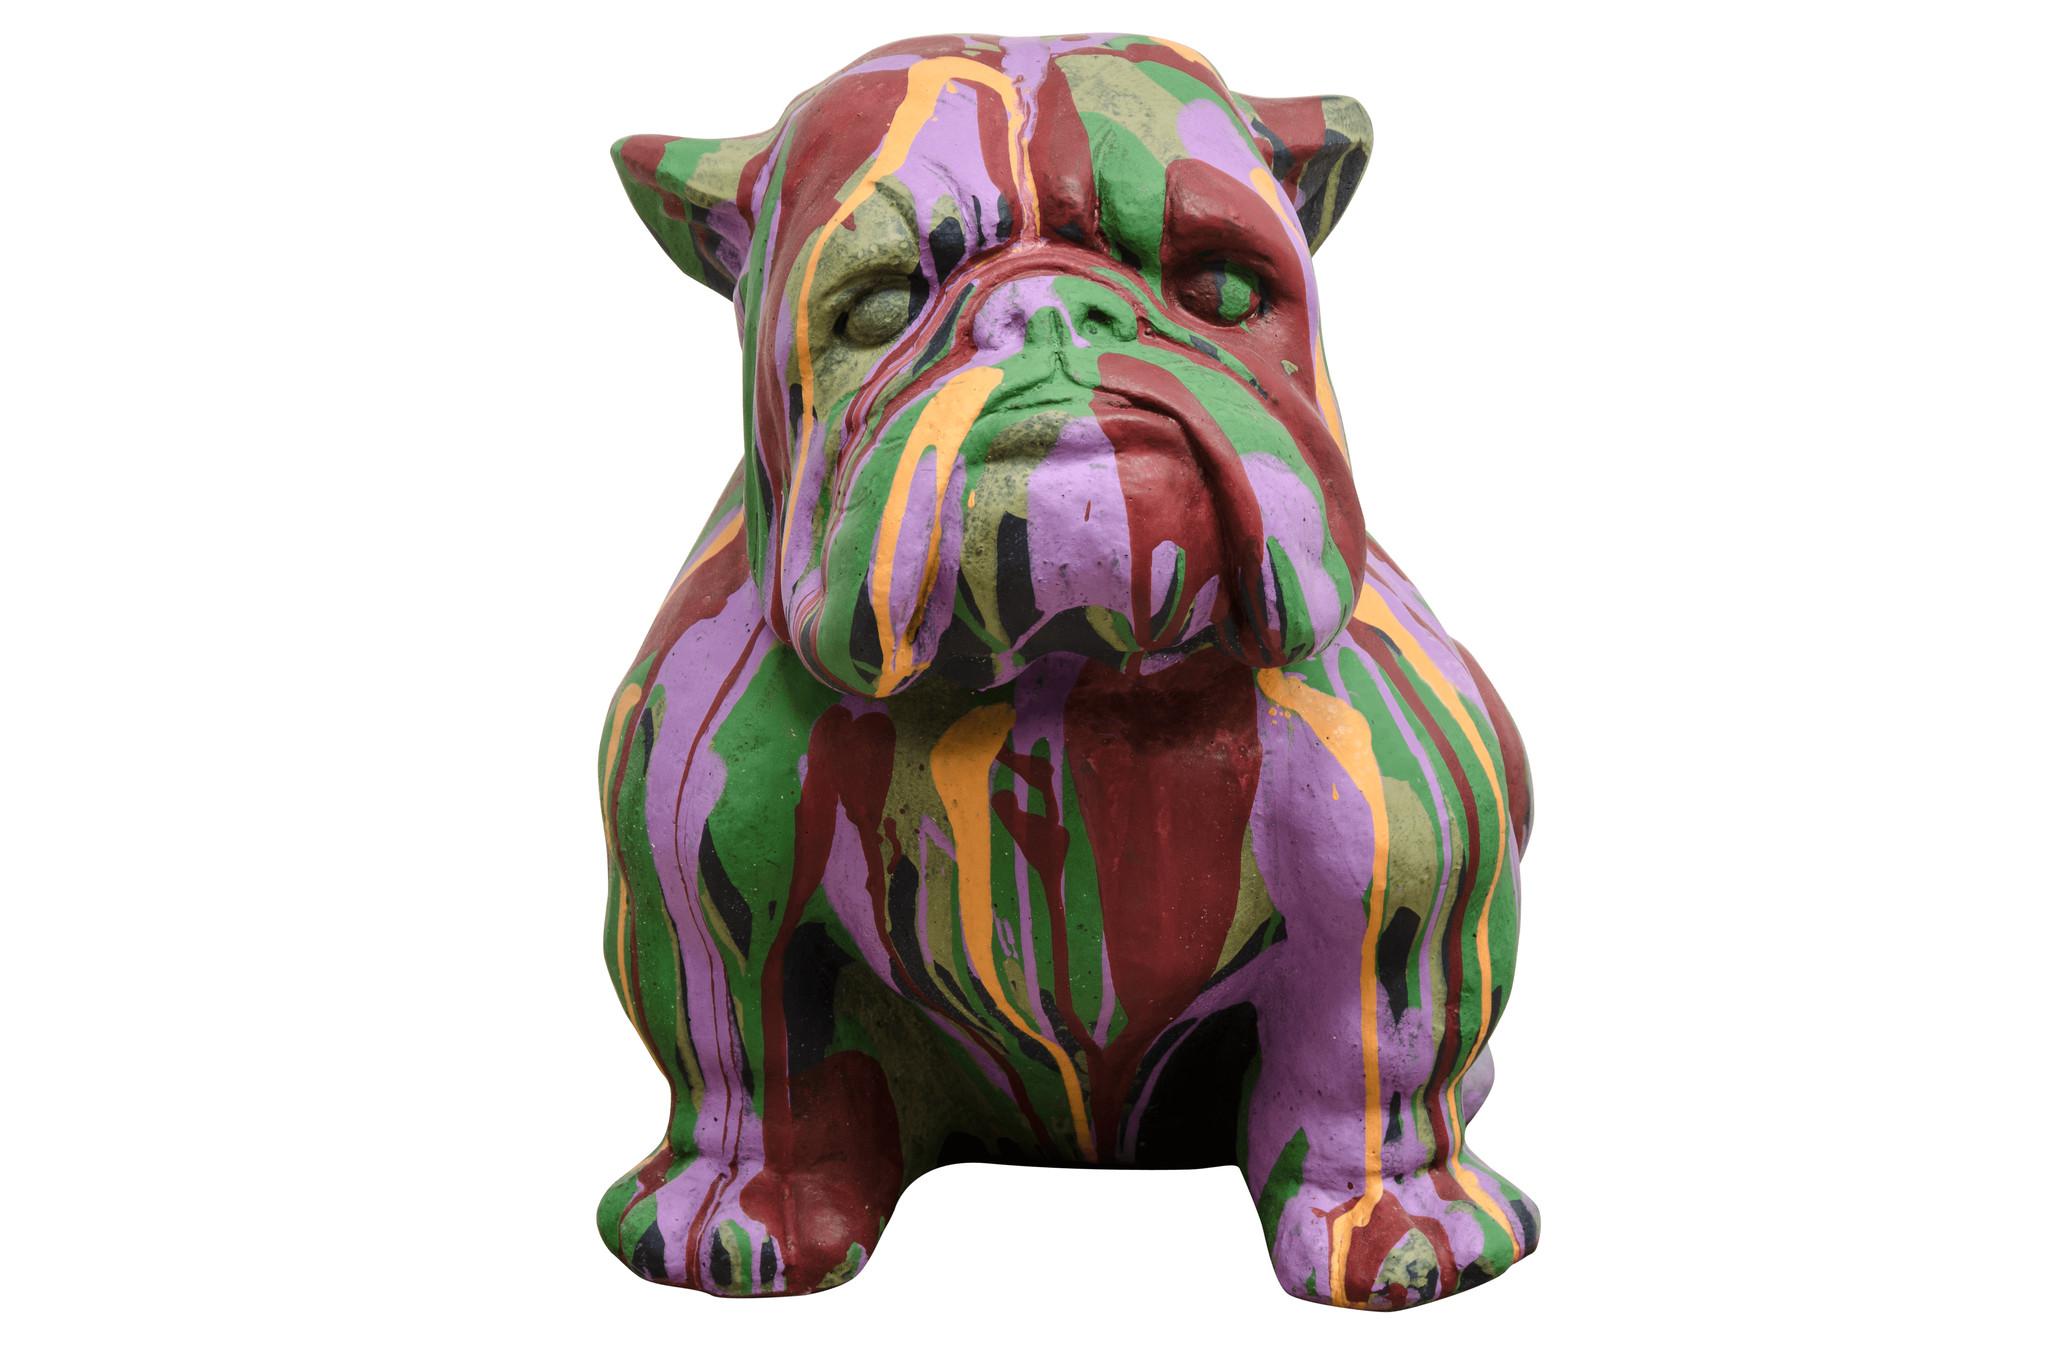 Фигурка BulldogСкульптуры<br><br><br>Material: Цемент<br>Ширина см: 31.0<br>Высота см: 44.0<br>Глубина см: 41.0